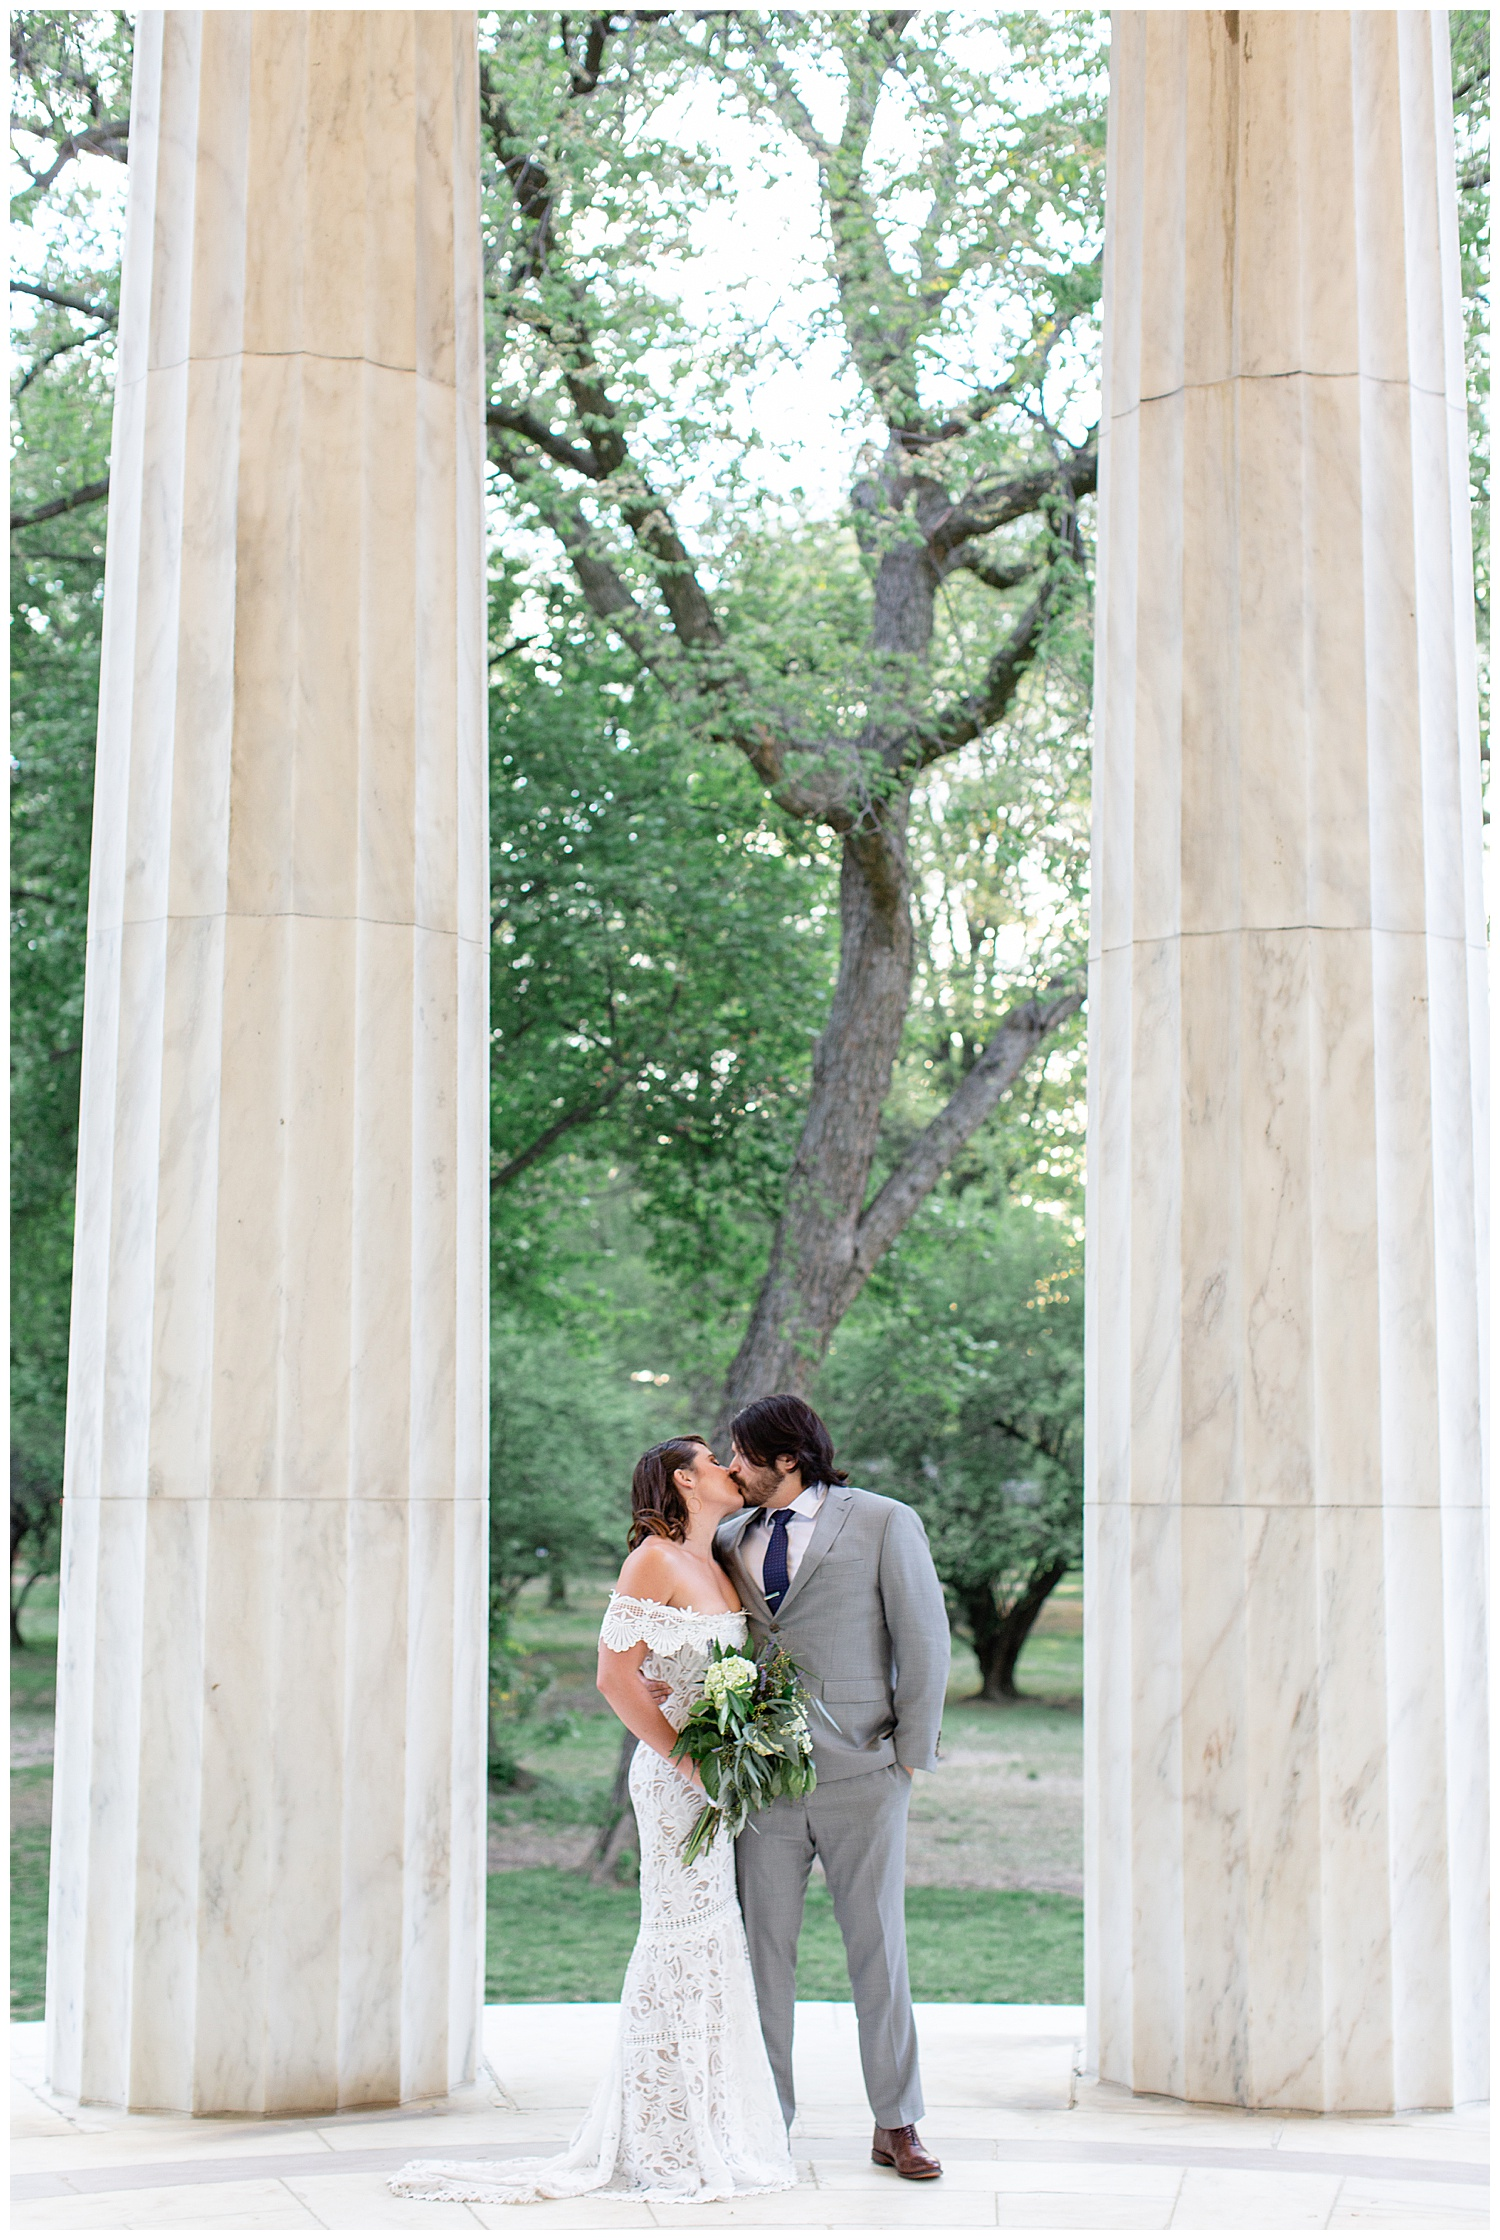 emily-belson-photography-washington-dc-wedding-30.jpg